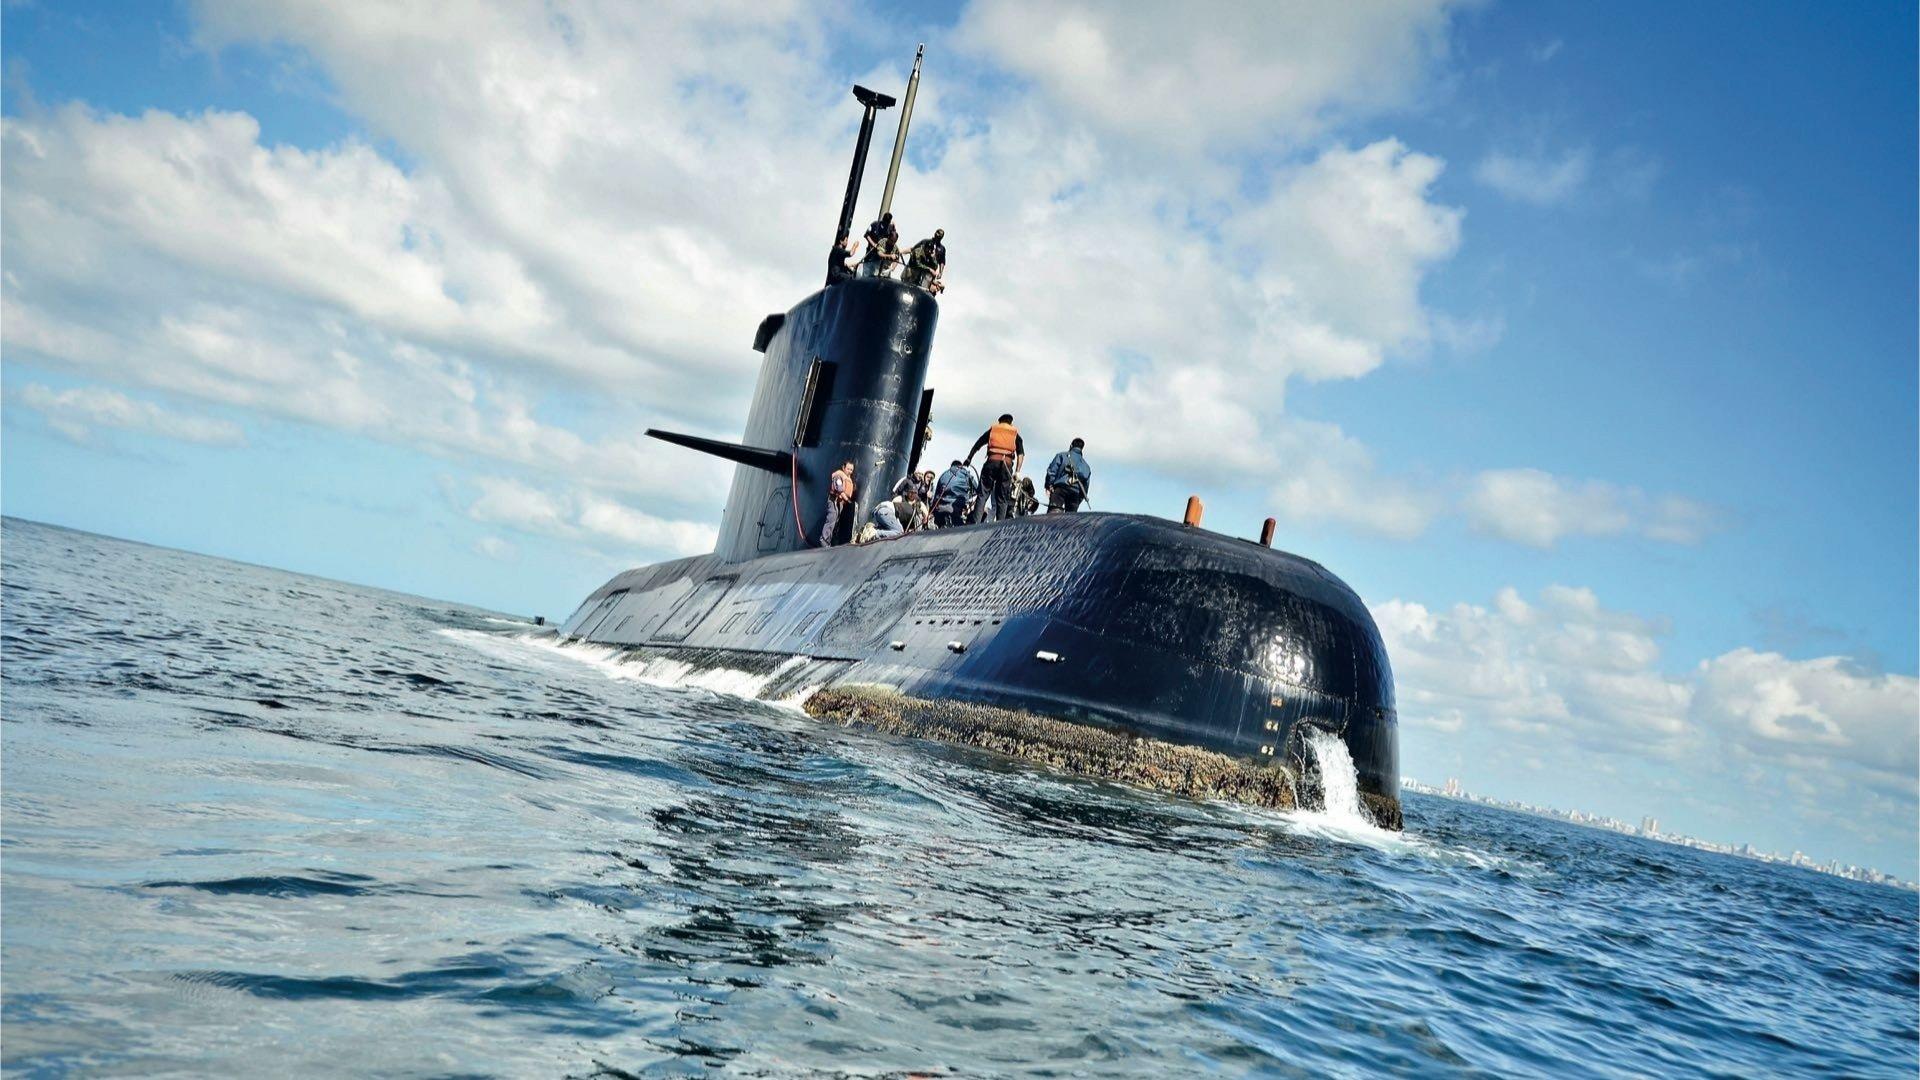 ara san juan sottomarino argentino